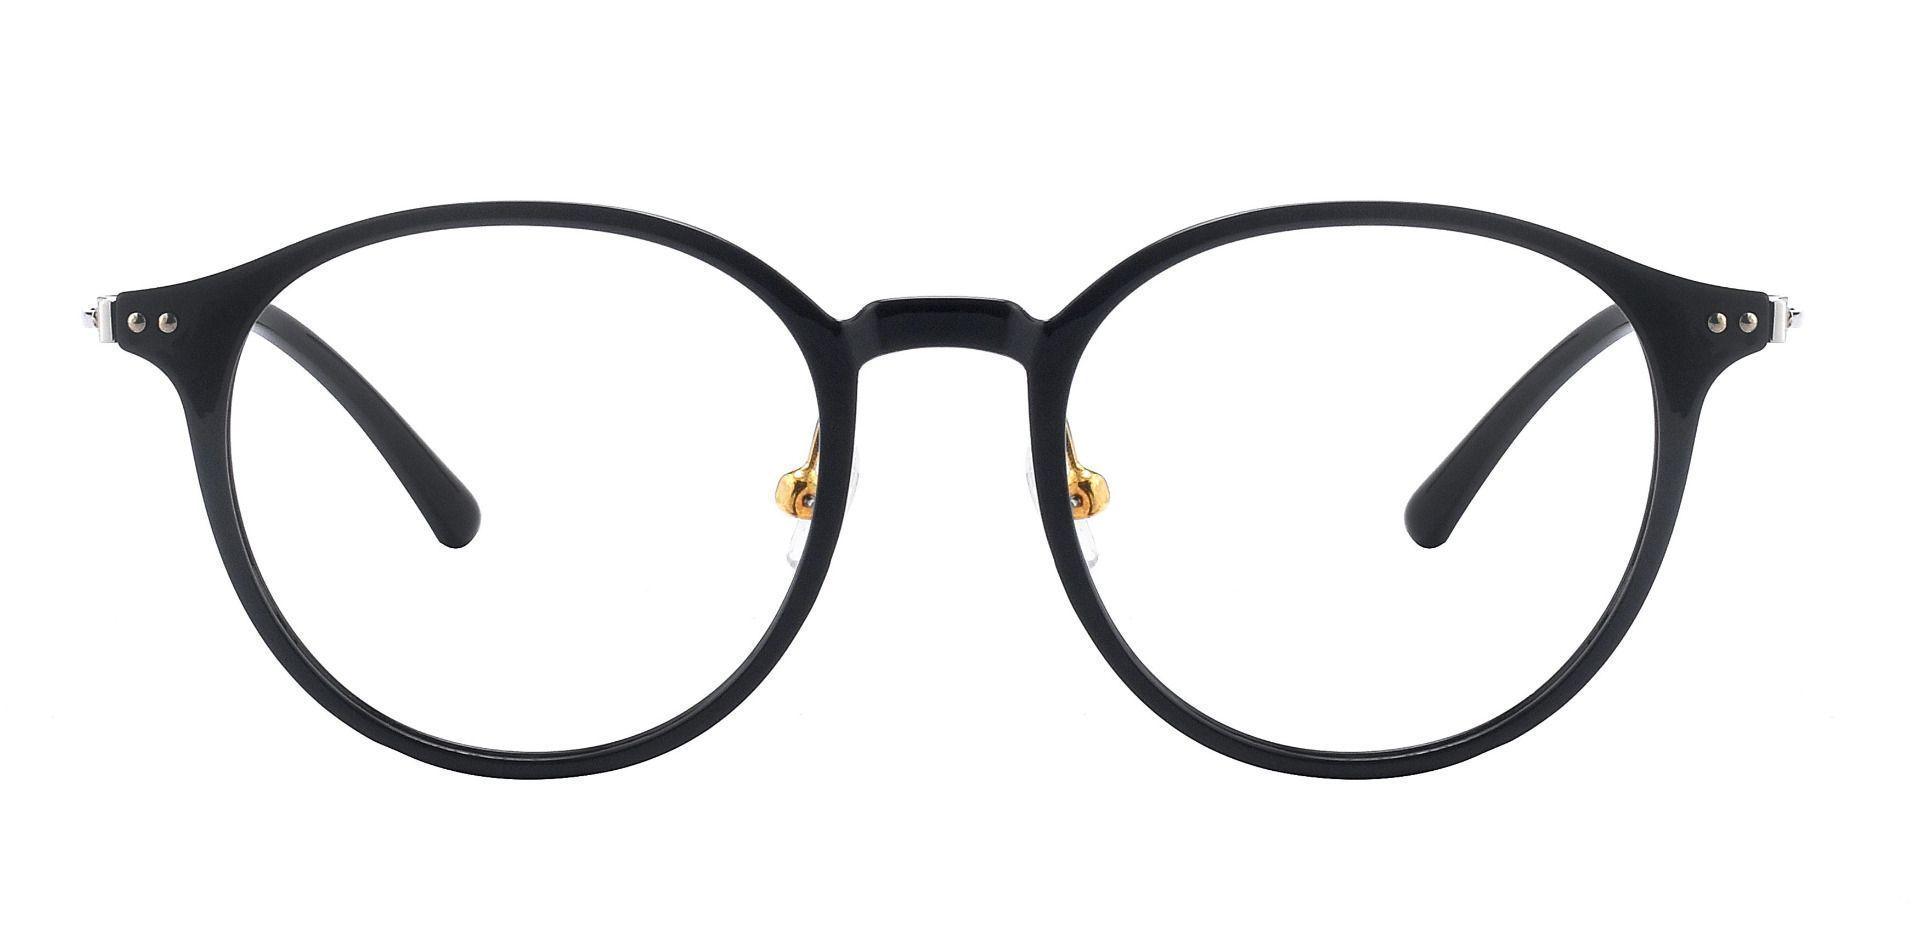 Meyer Round Prescription Glasses - Black